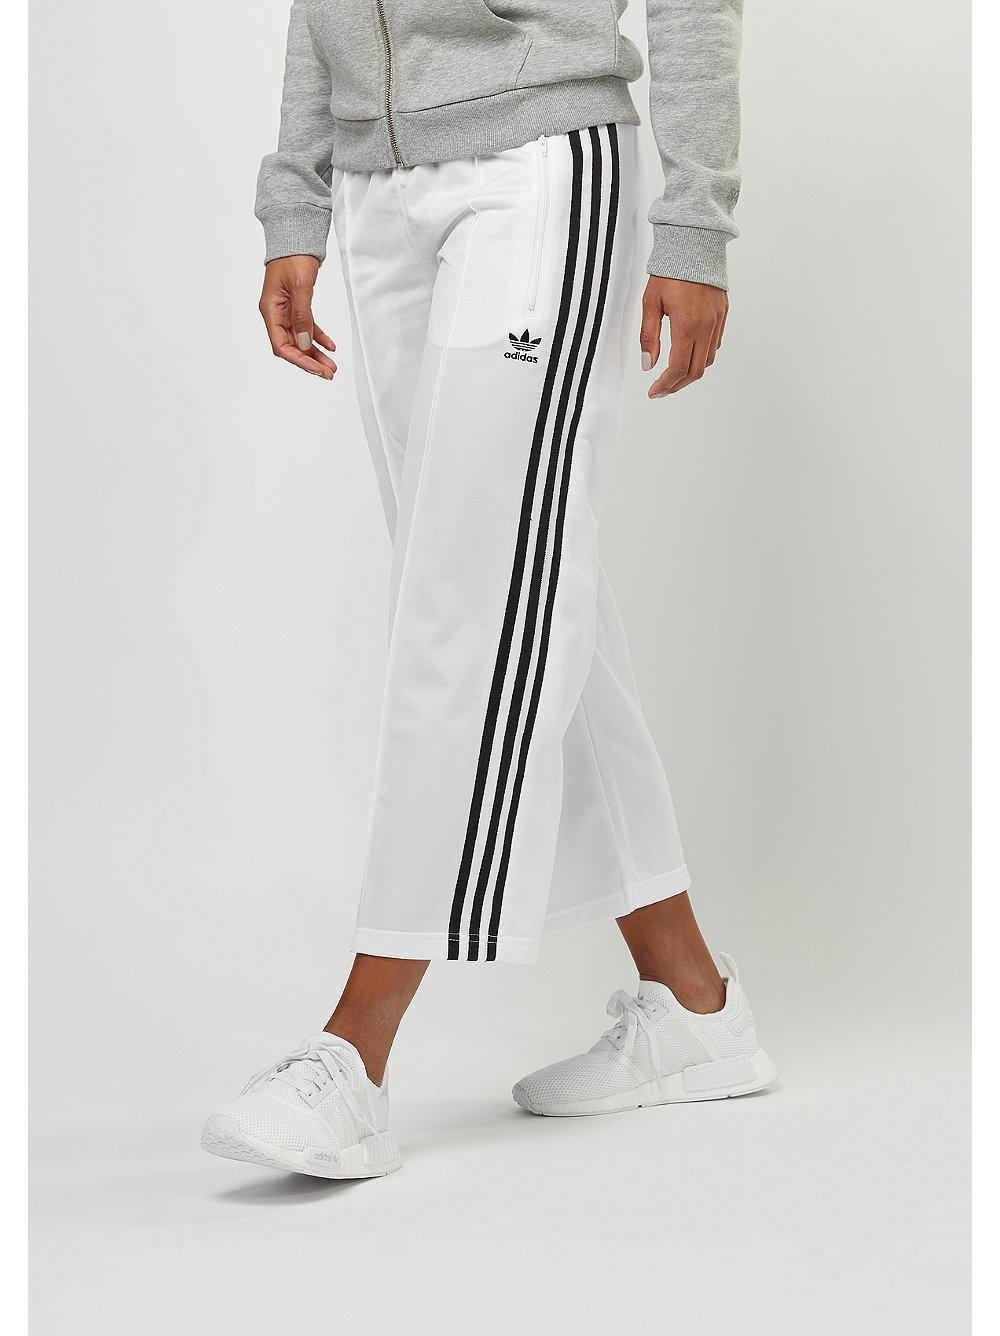 adidas 7-8 Sailor Pant white